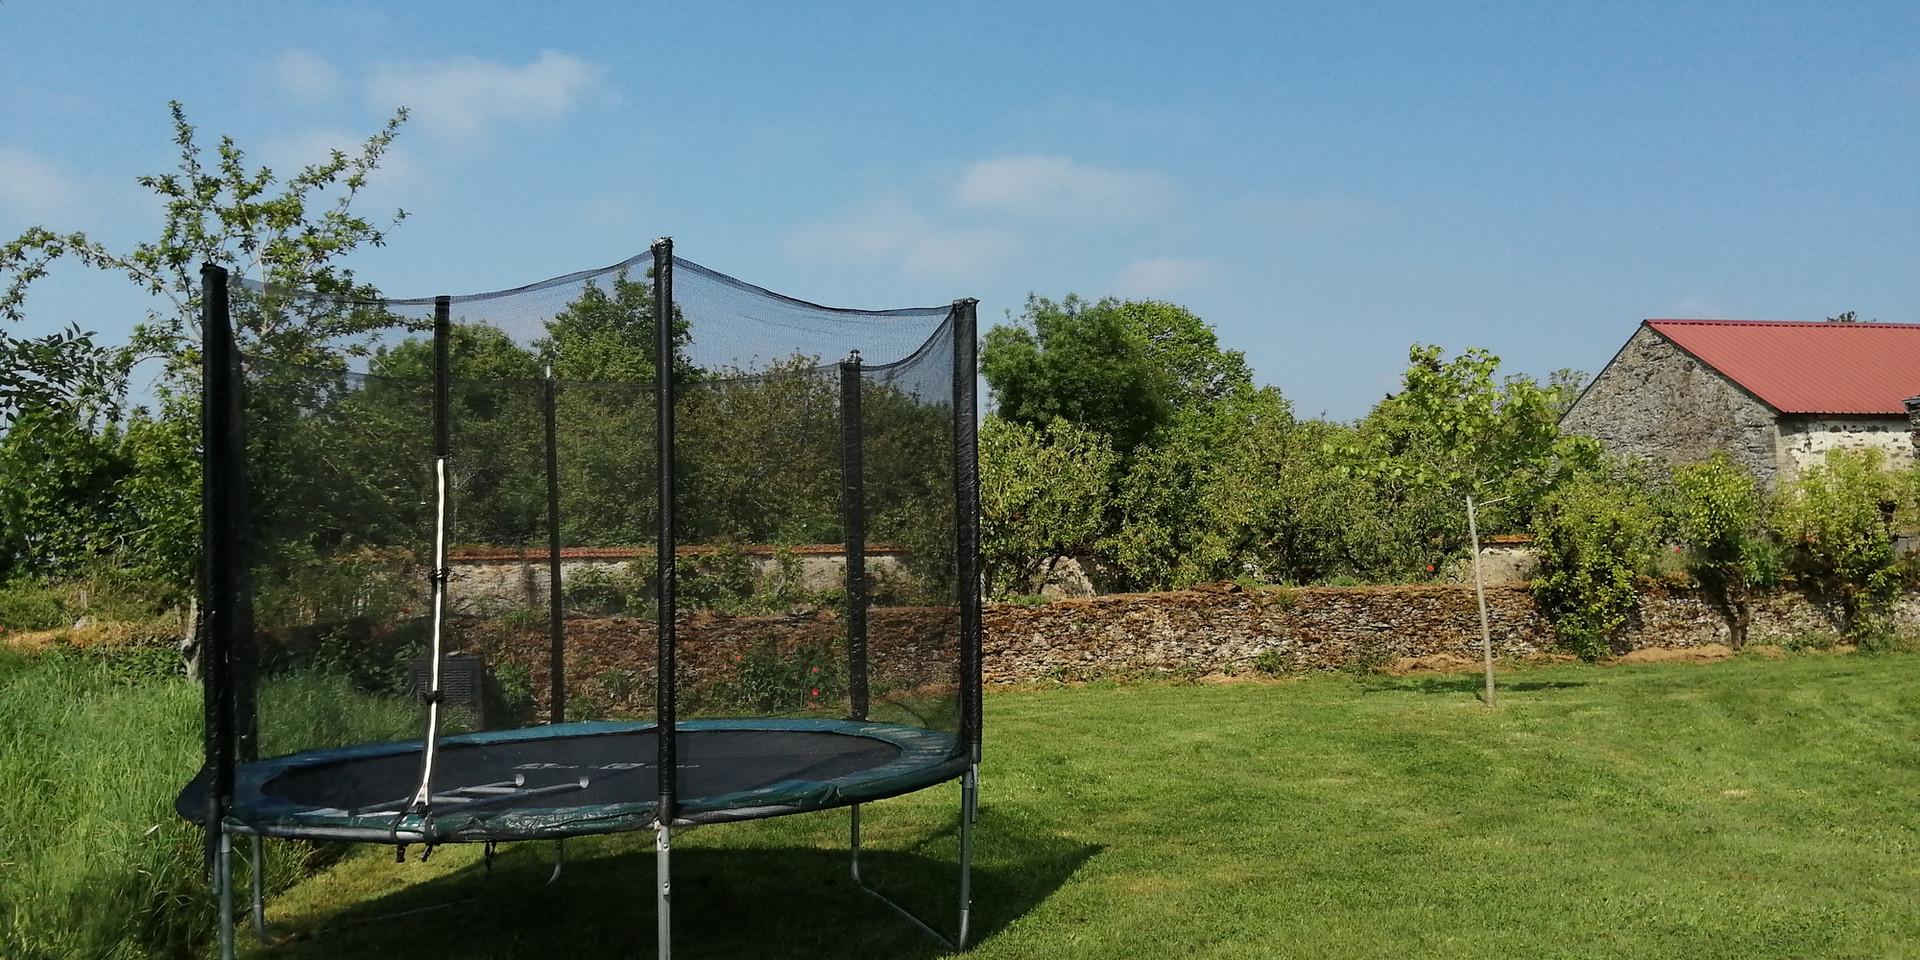 Le Figonier trampoling